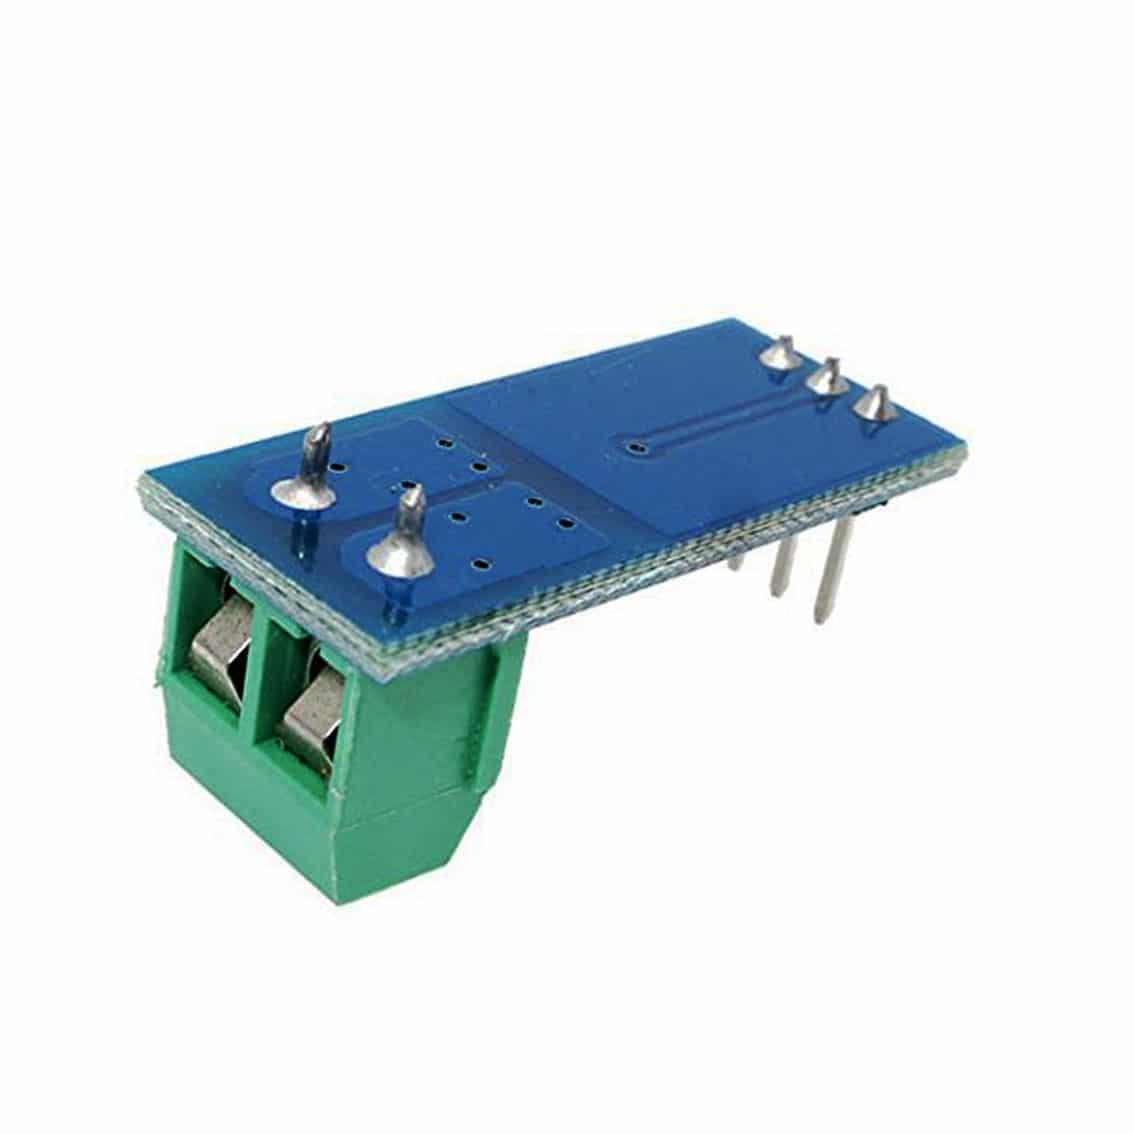 30A Range Current Sensor Module - ACS712 ACS712T ACS712TELC-30A - Phipps  Electronics